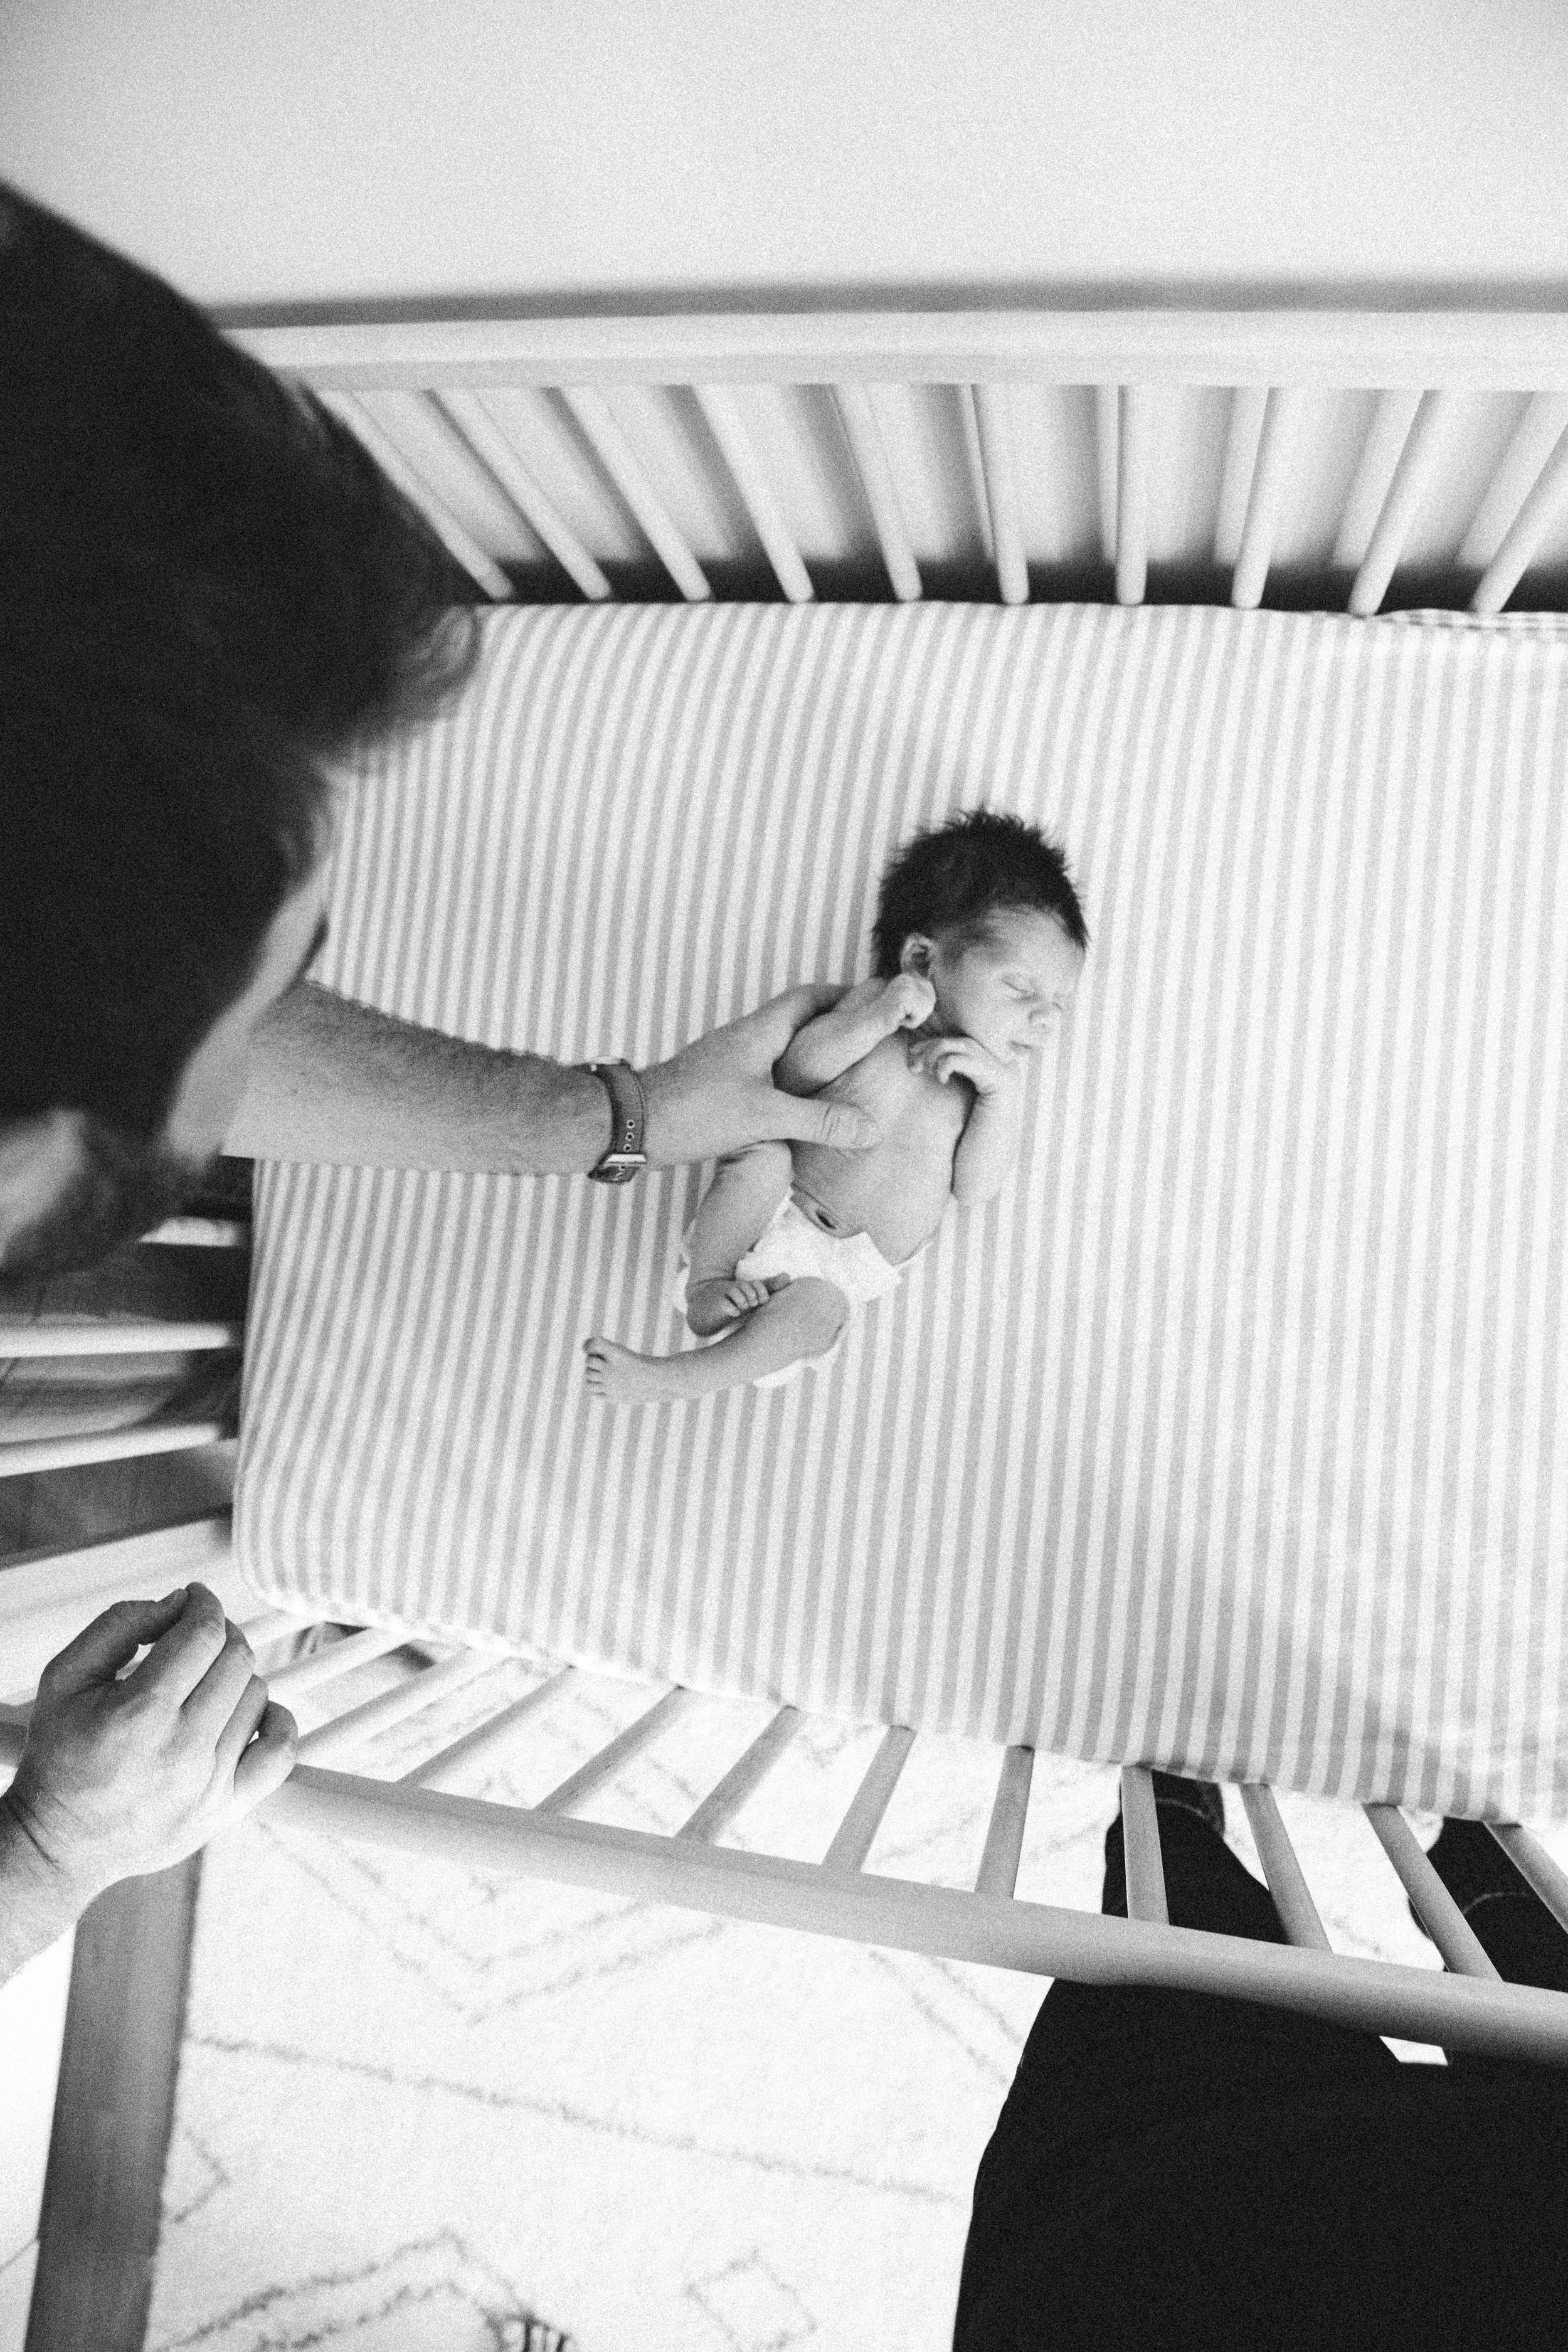 Clinton Hill Baby Kaden-3743-3.jpg